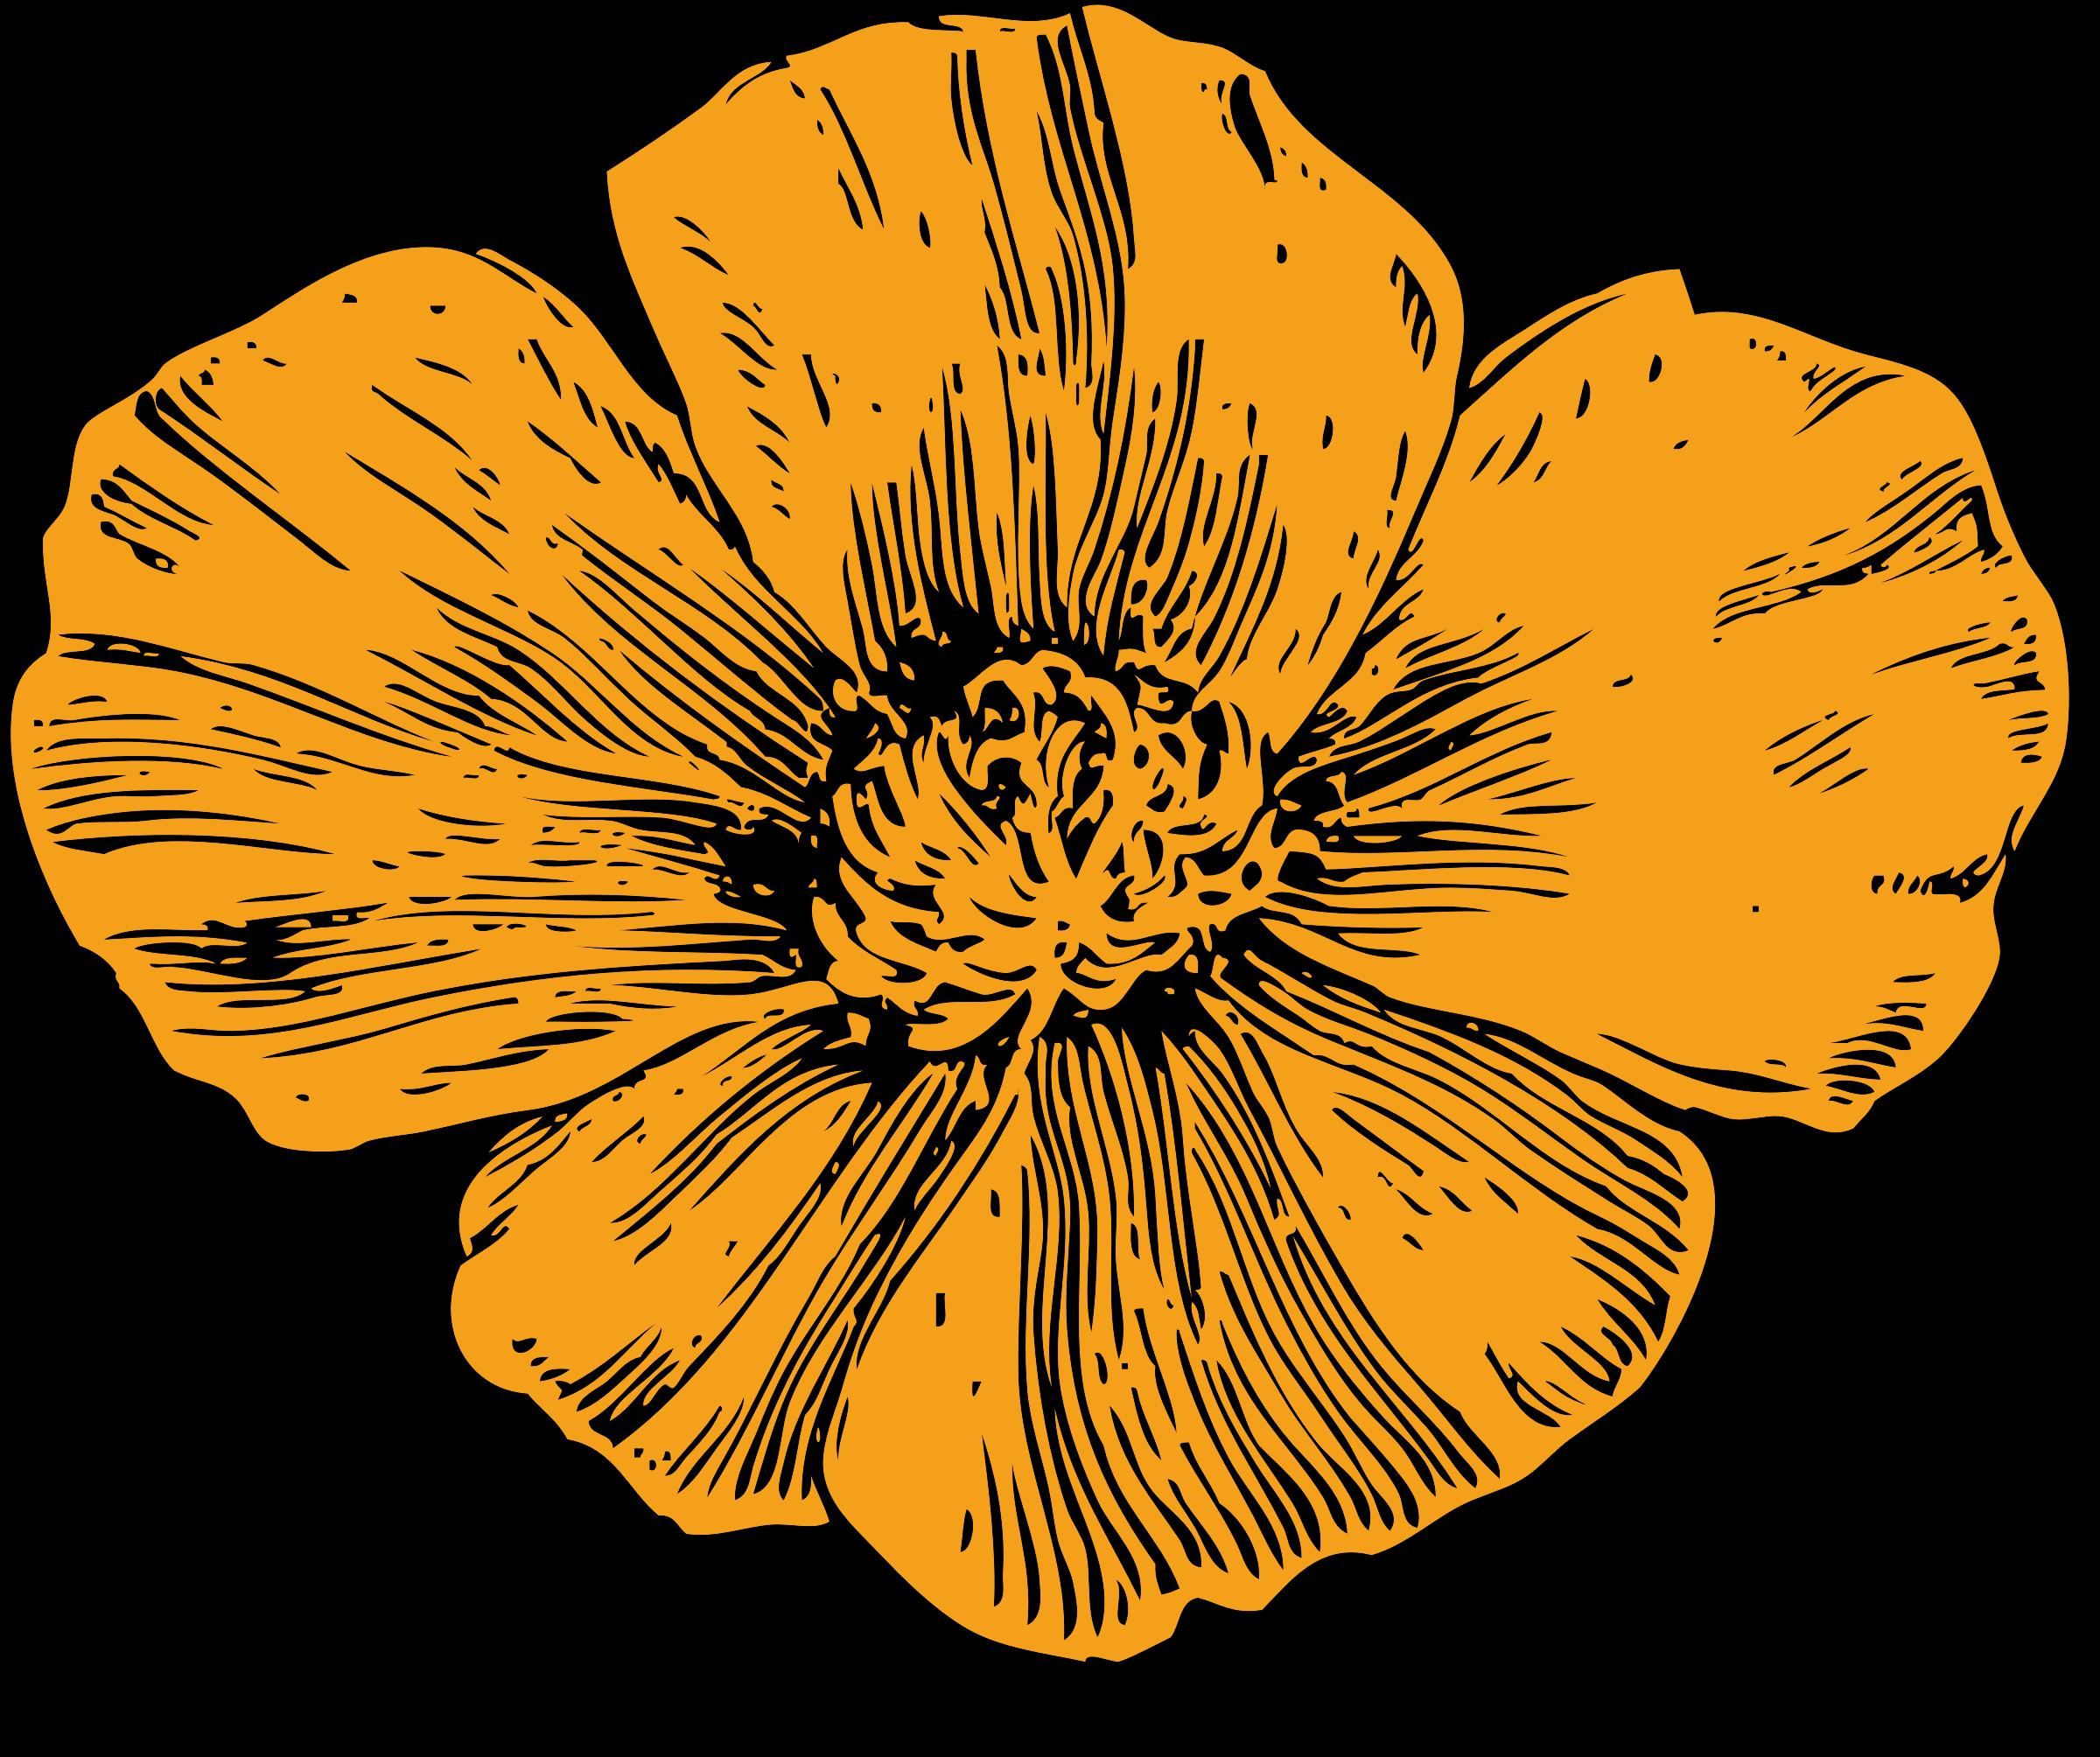 Poppy flower clipart image transparent download Clipart - California poppy image transparent download